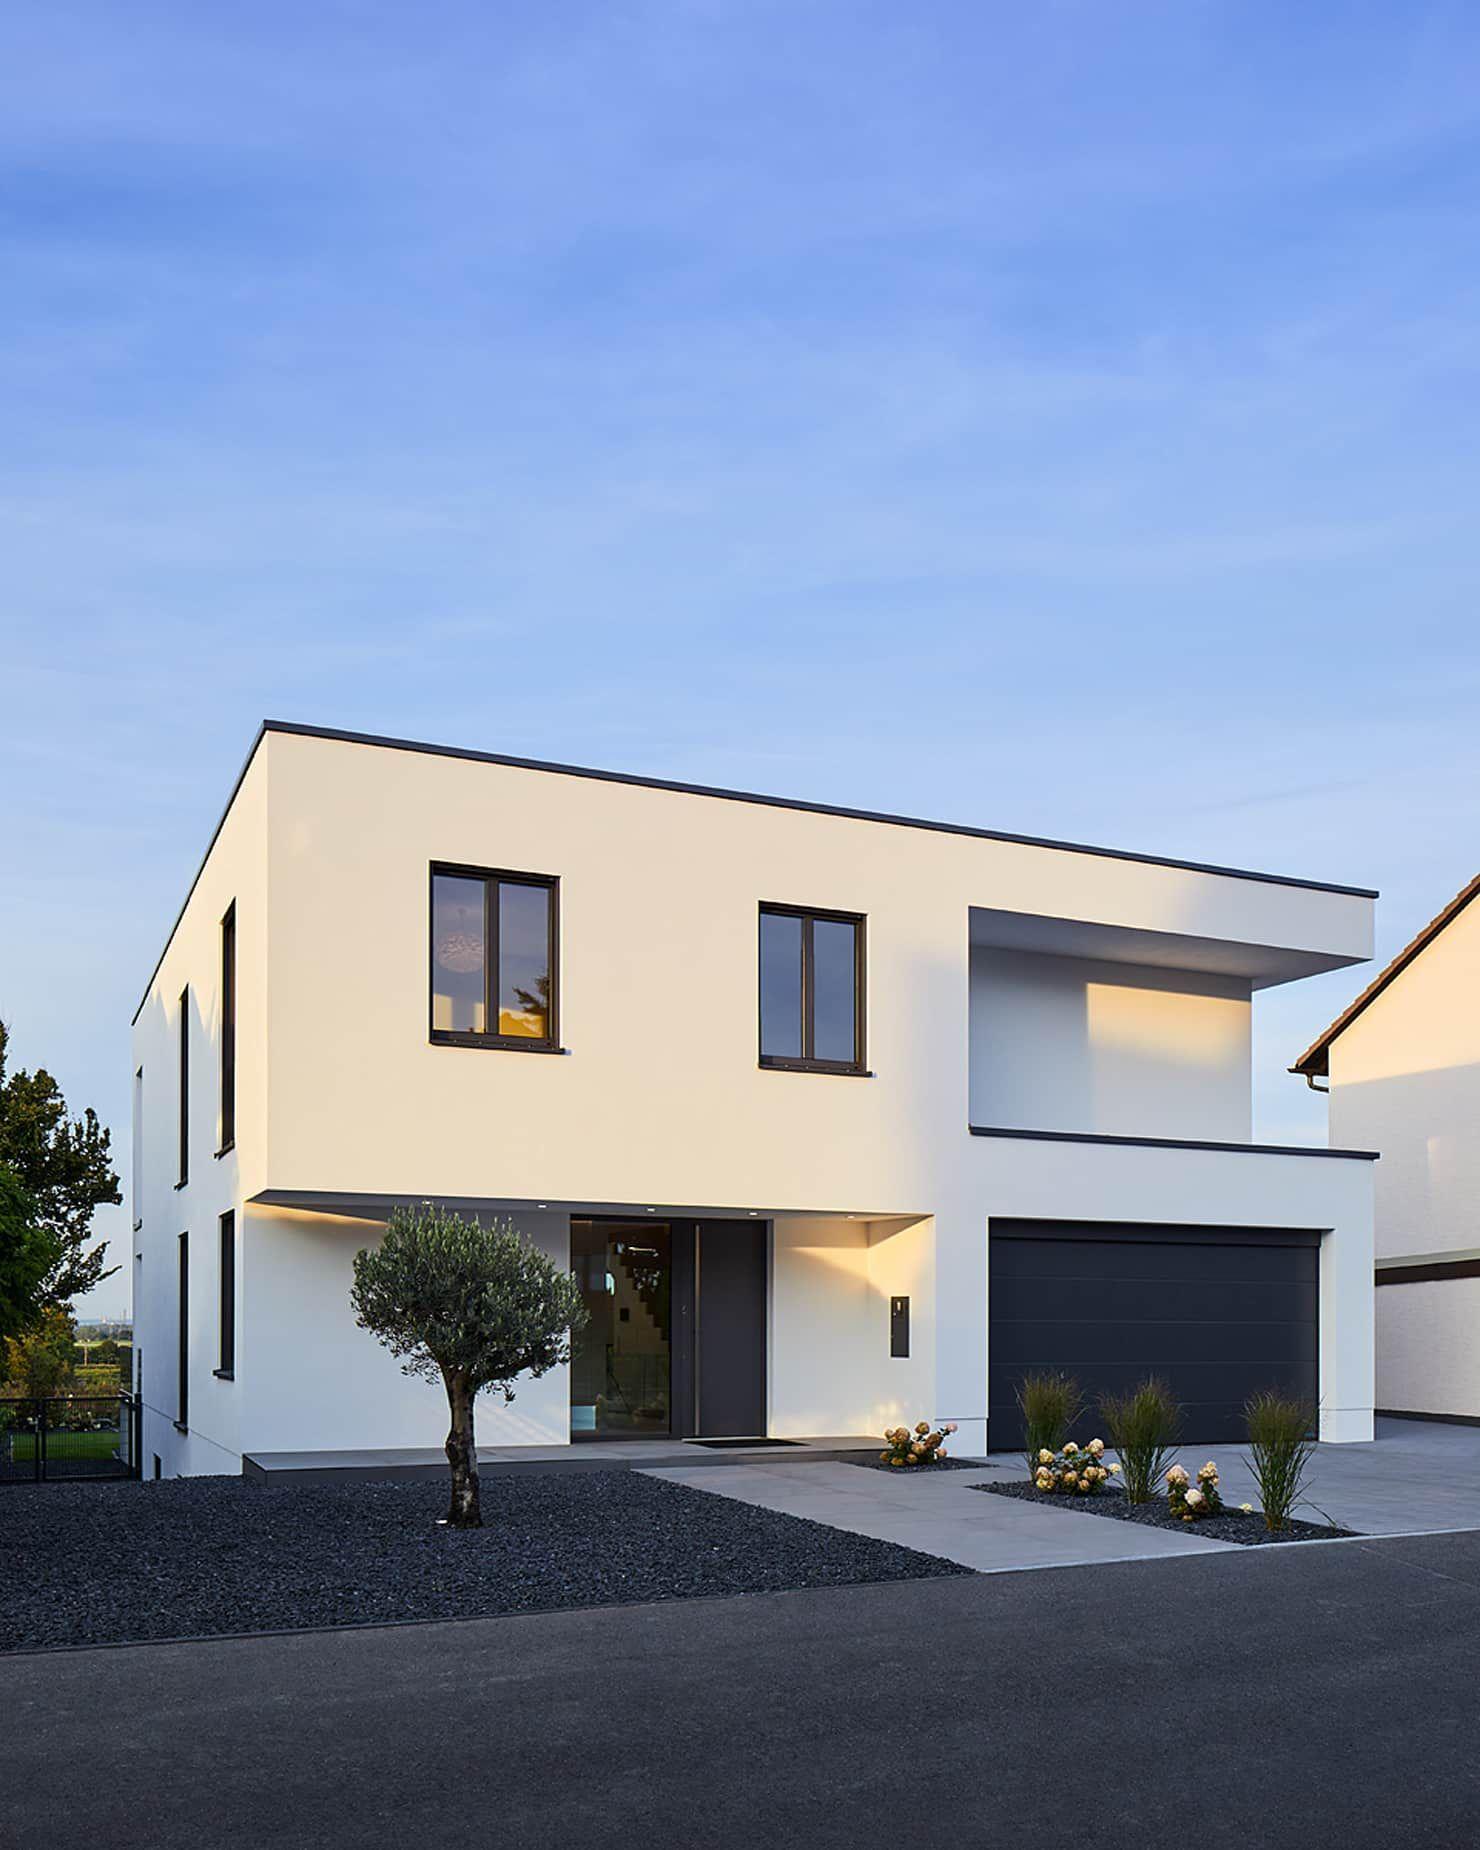 Photo of Efh in bornheim modern houses by philip kistner fotografie modern | homify